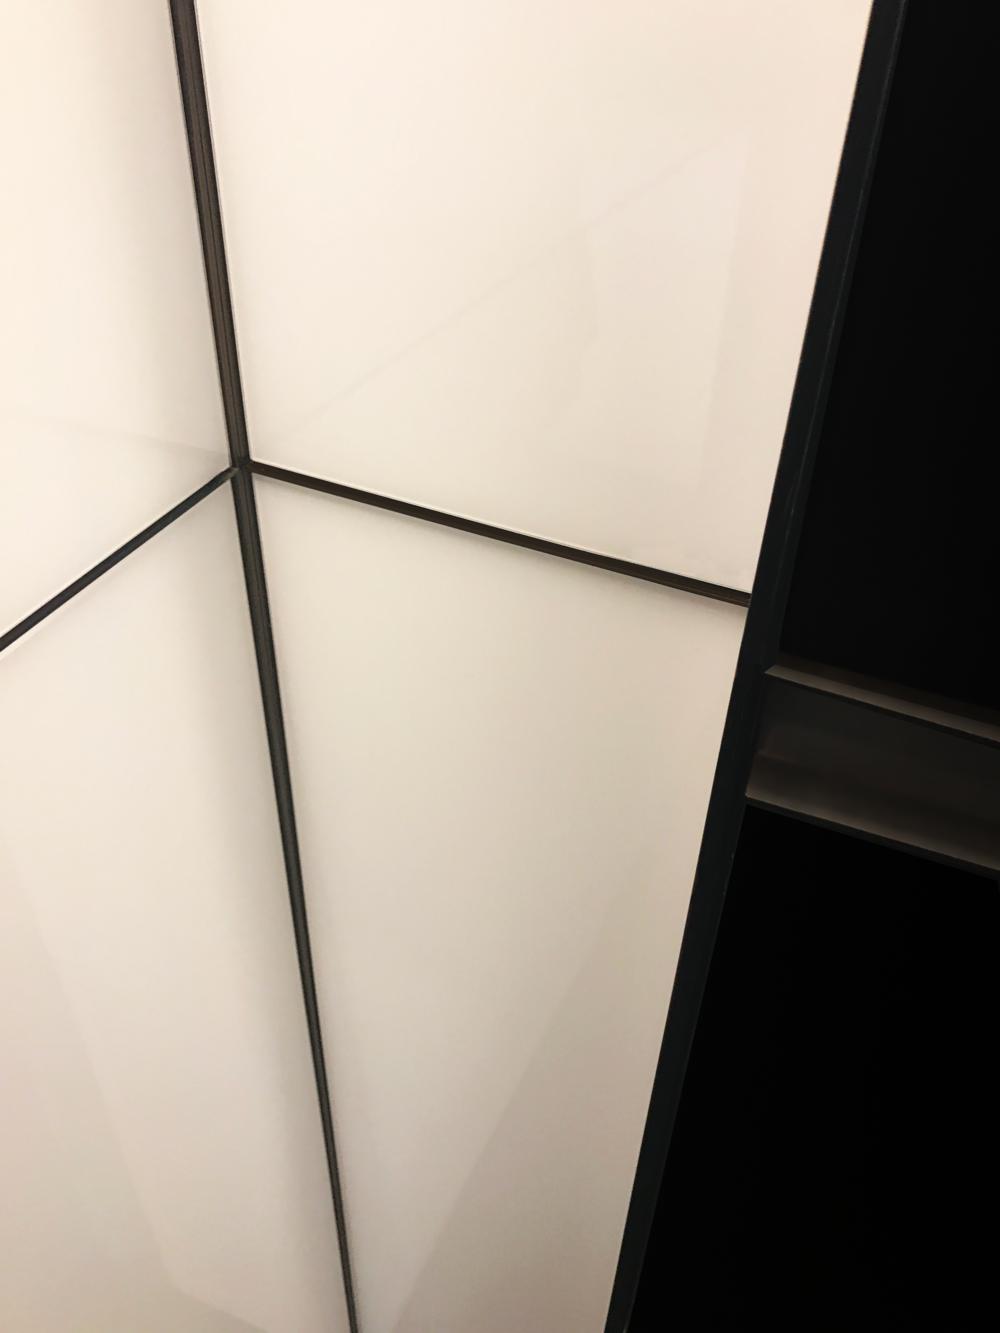 11_WALL_corner_detail_003.png